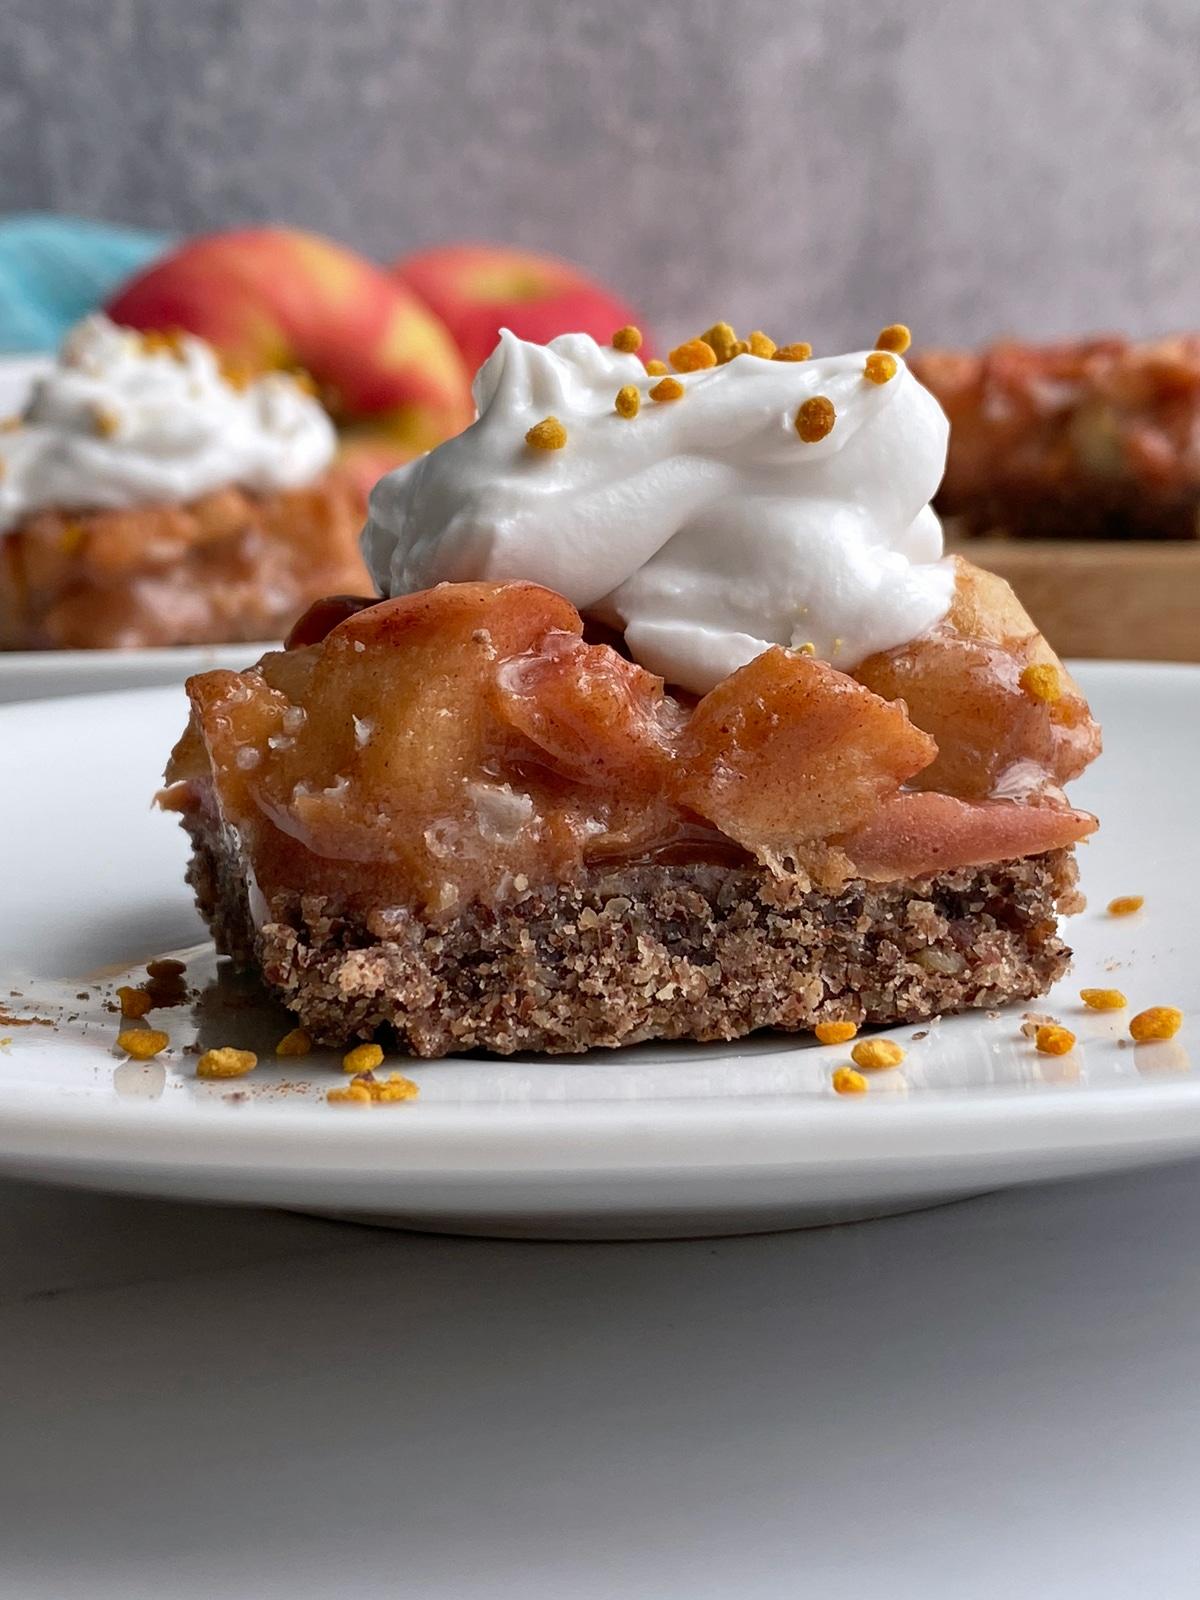 close-up-of-apple-pie-slice